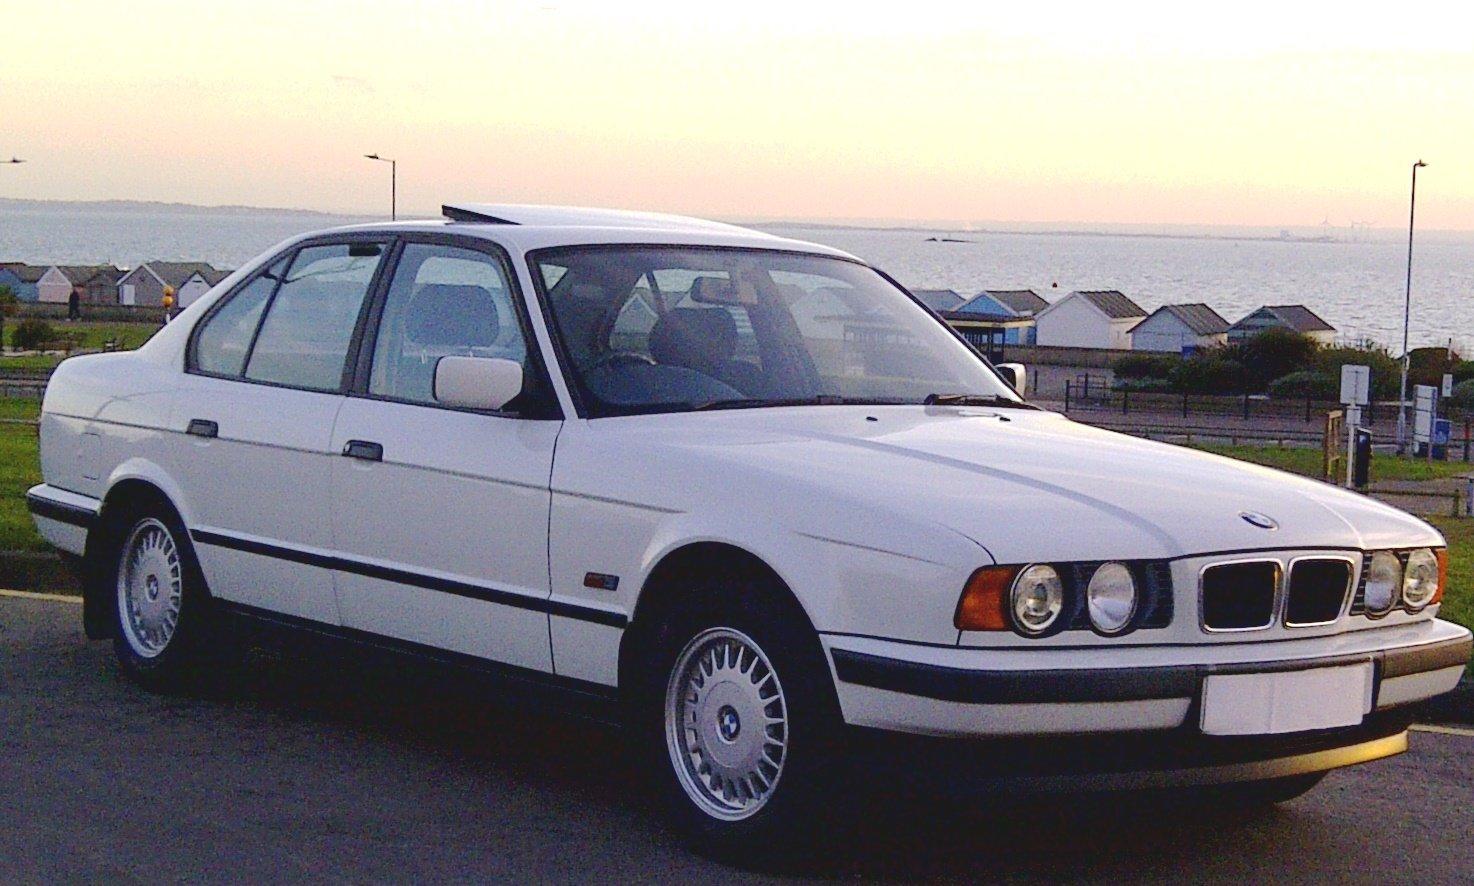 Classic 1994 BMW E34 525i Auto 65000 miles For Sale (picture 2 of 6)